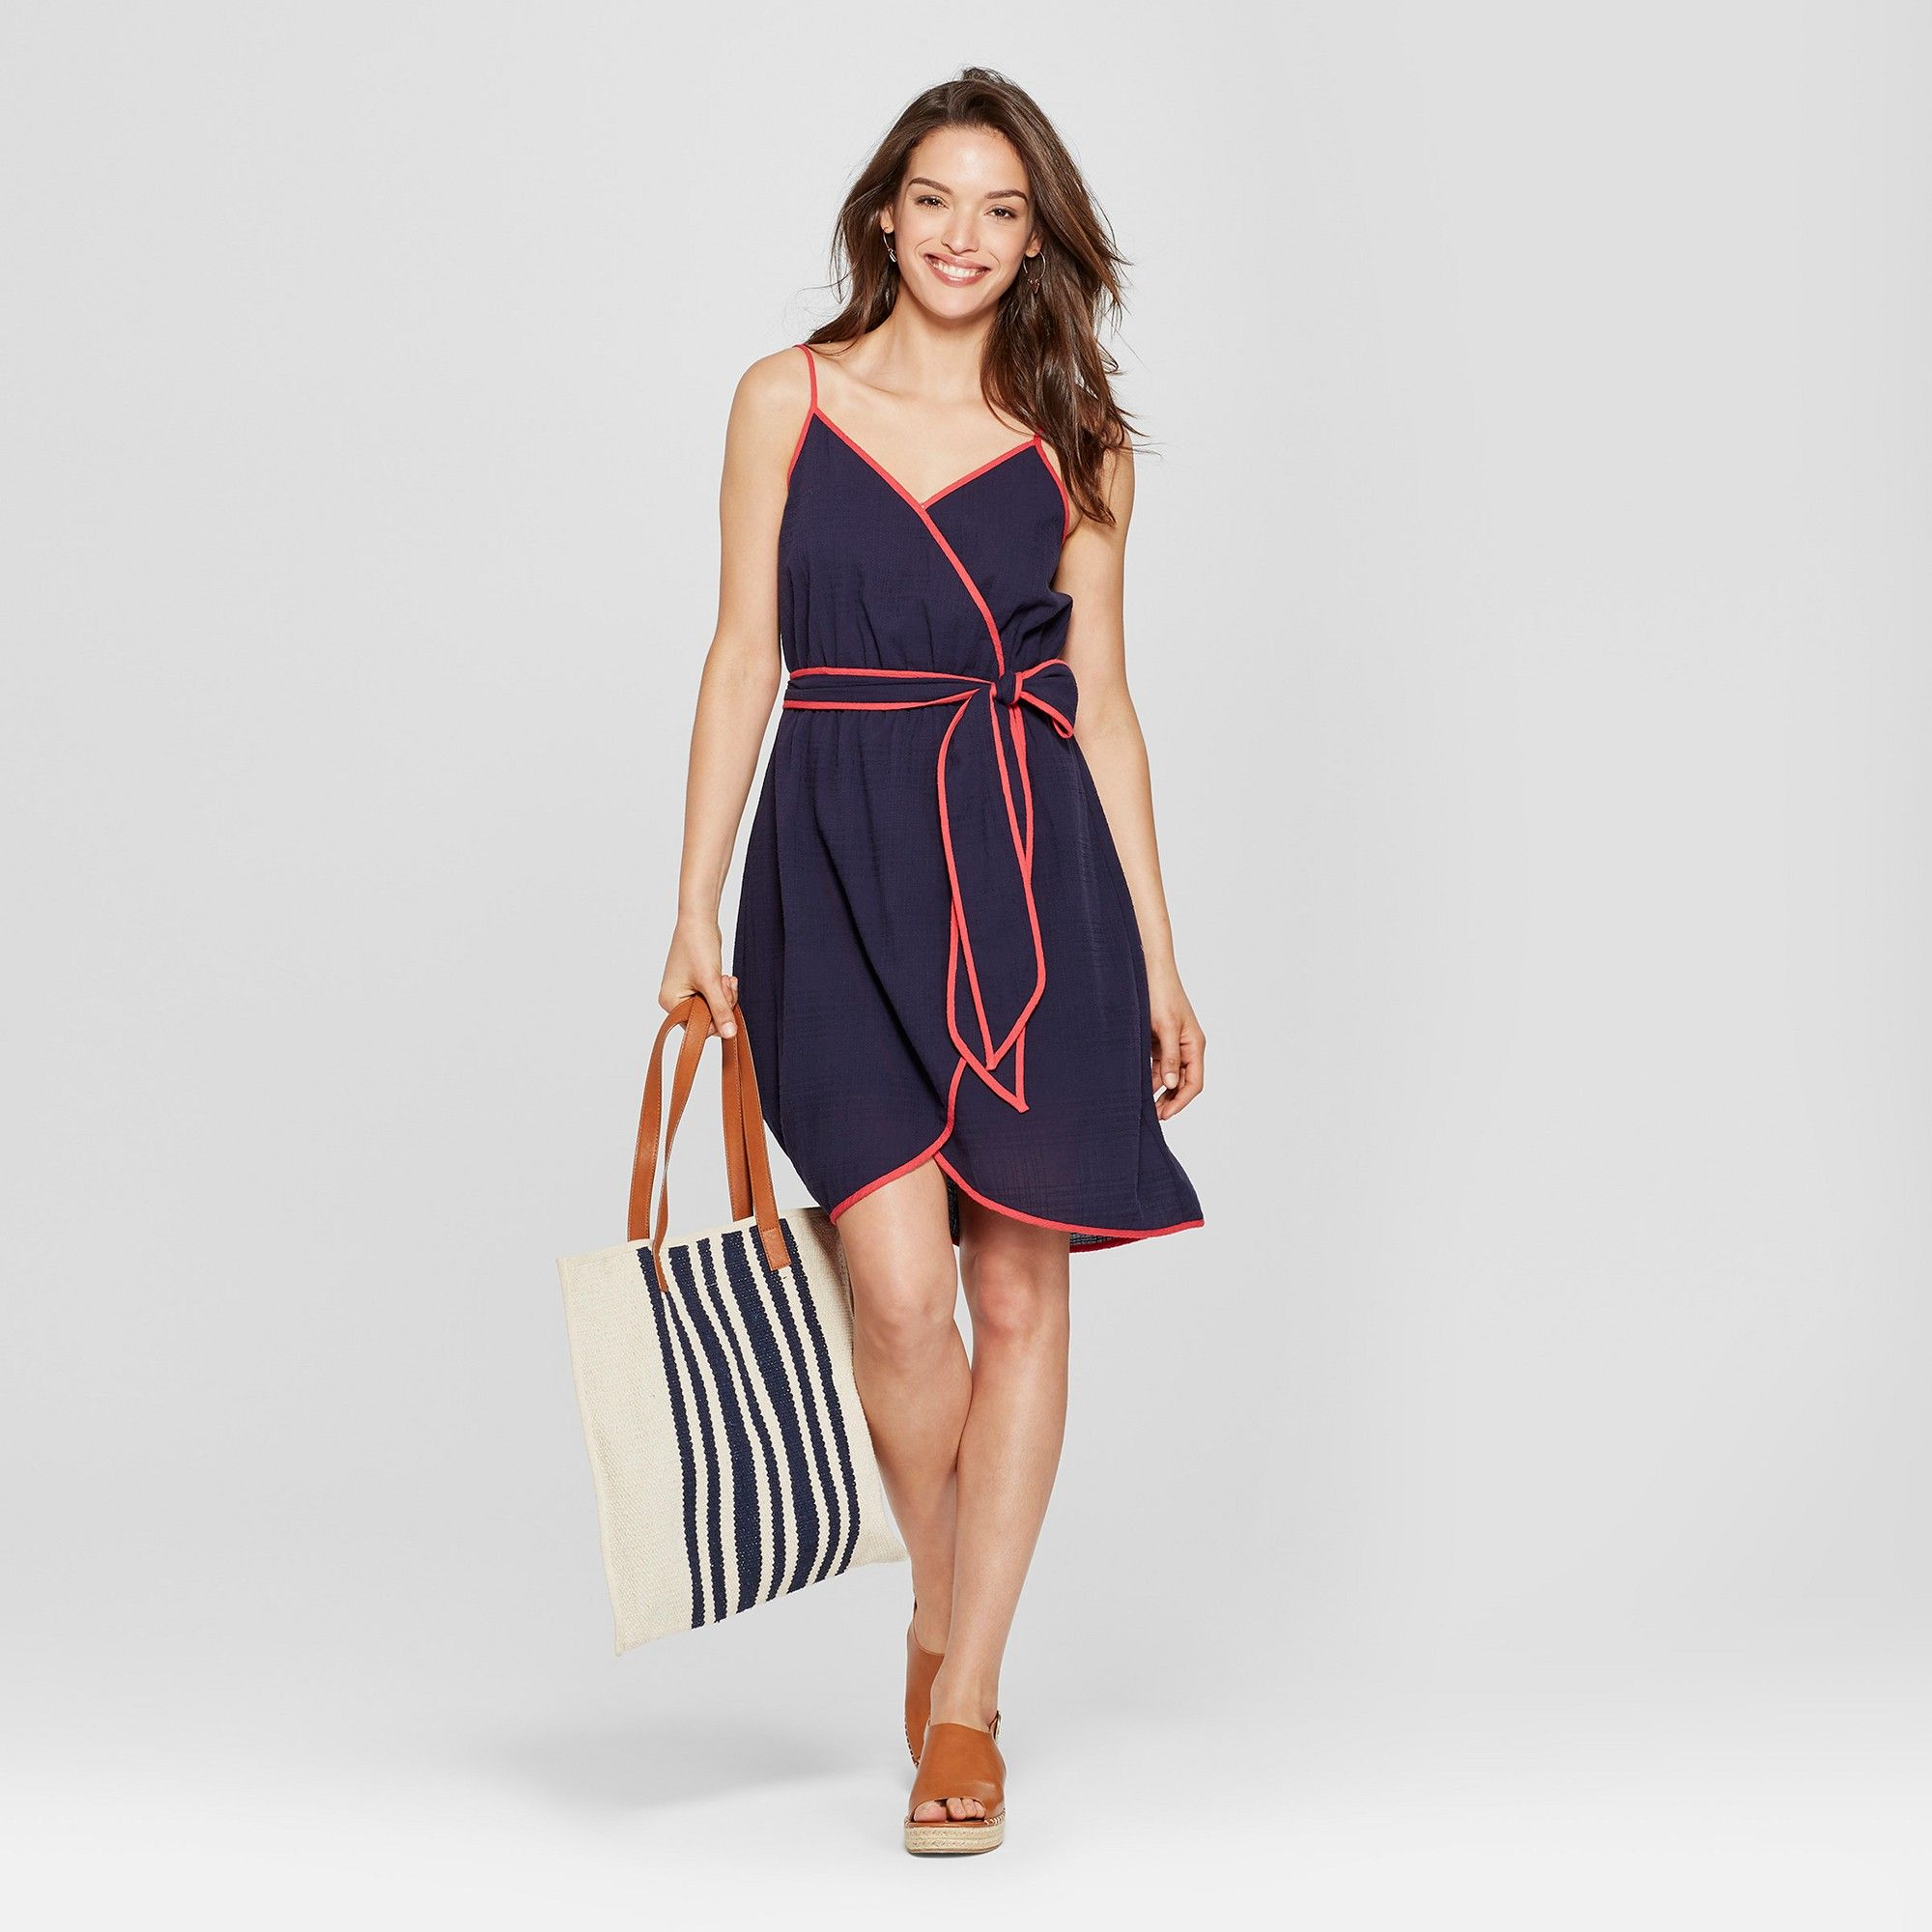 e88f1099e1 Women s Wrap Contrast Piping Dress - Universal Thread Navy Xxl